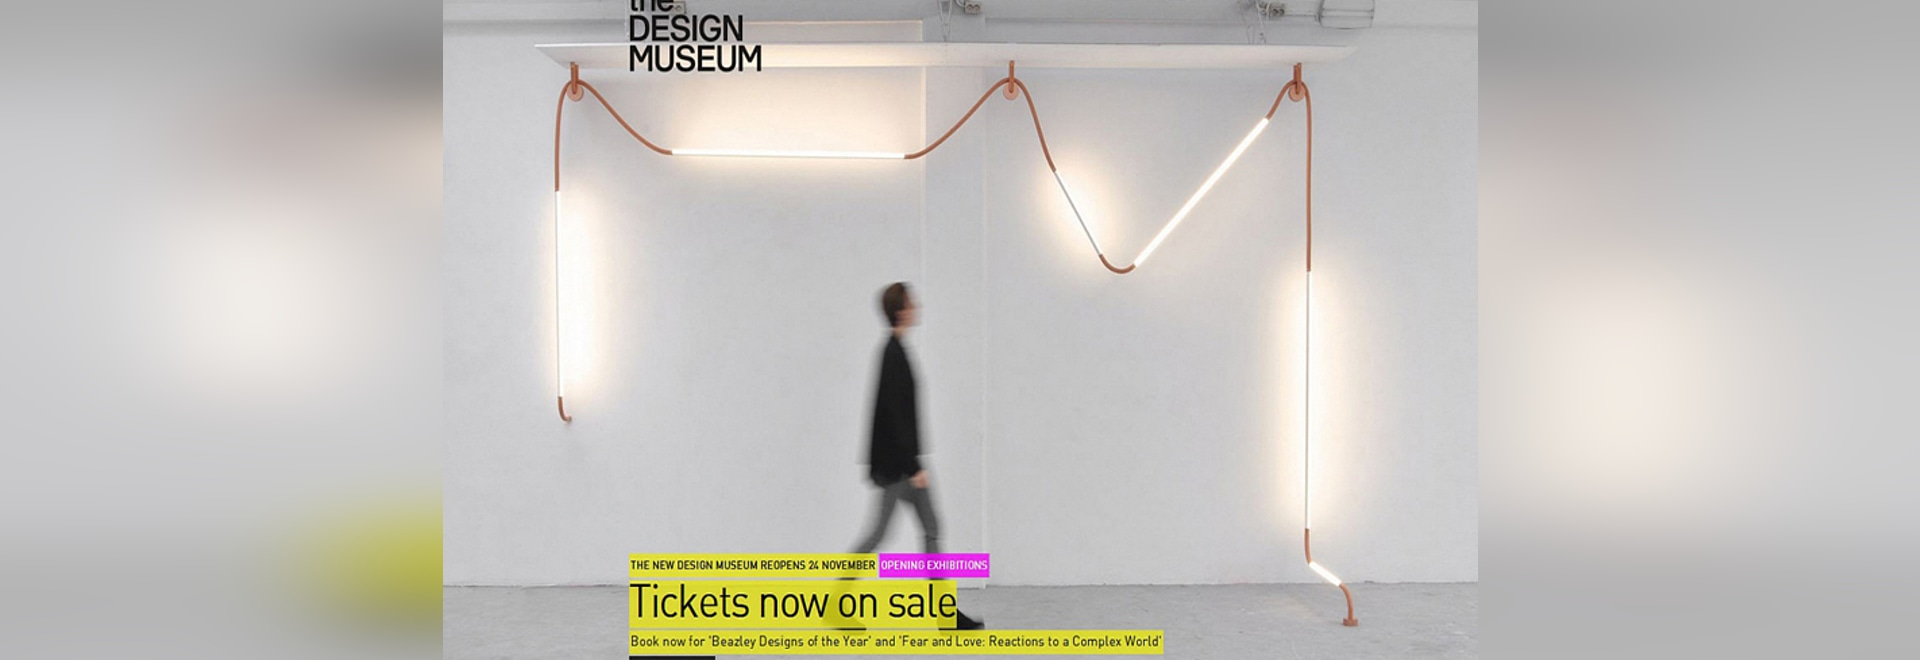 London: The Hybrid Museum